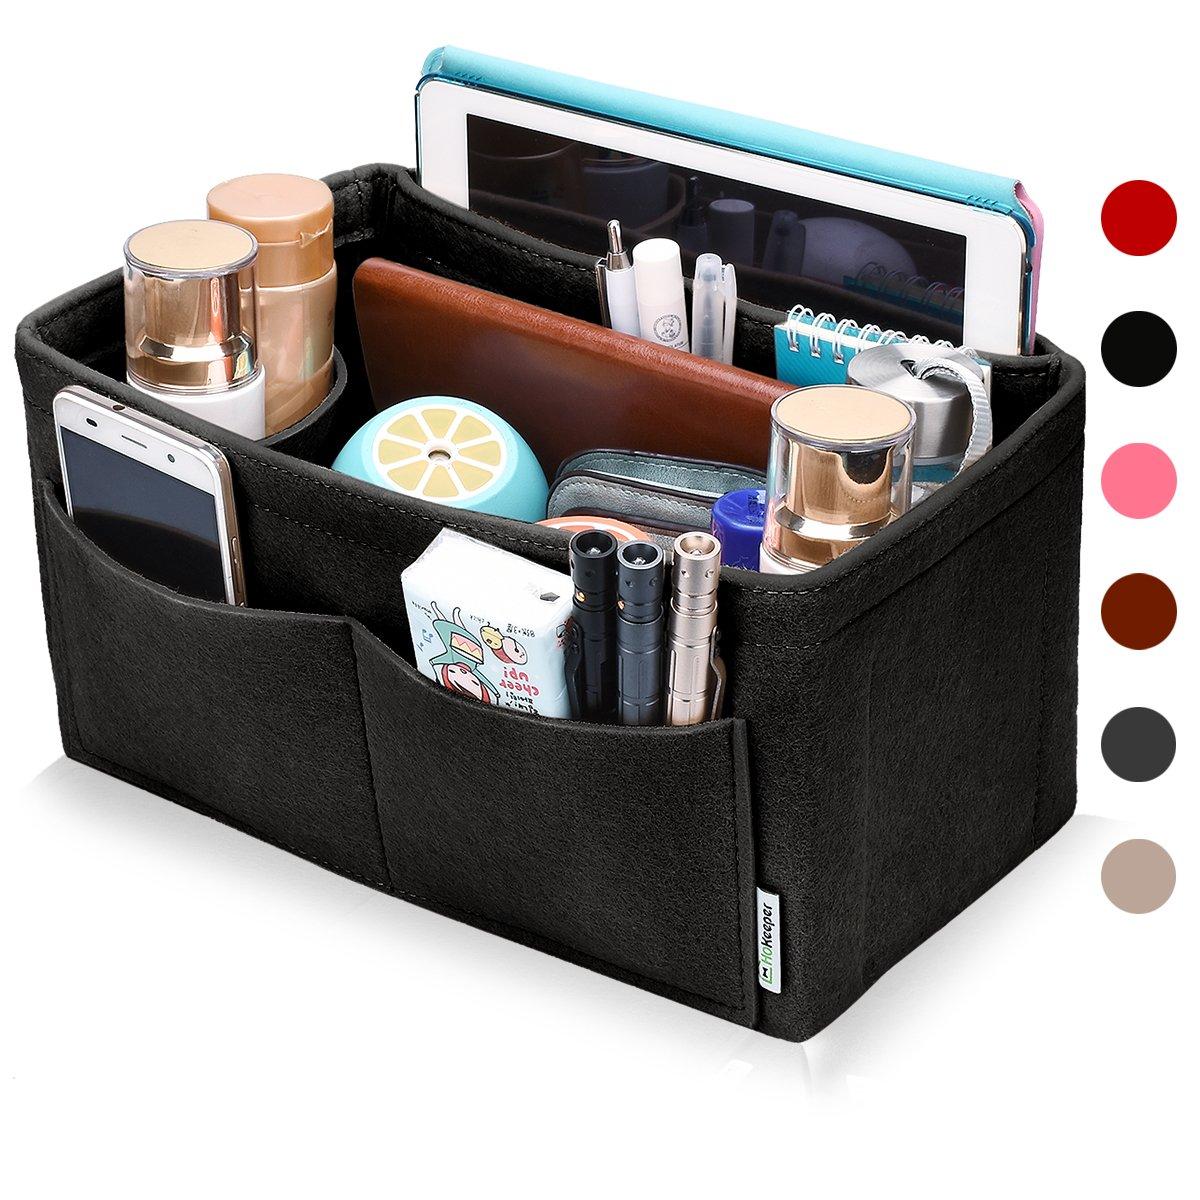 Hokeeper Felt Purse Insert Organizer, Handbag Organizer, Bag in Bag, Diaper Bag Organizer, Stand on Its Own,11 Compartments, 4 Sizes, 6 Colors (X-Large, Black)